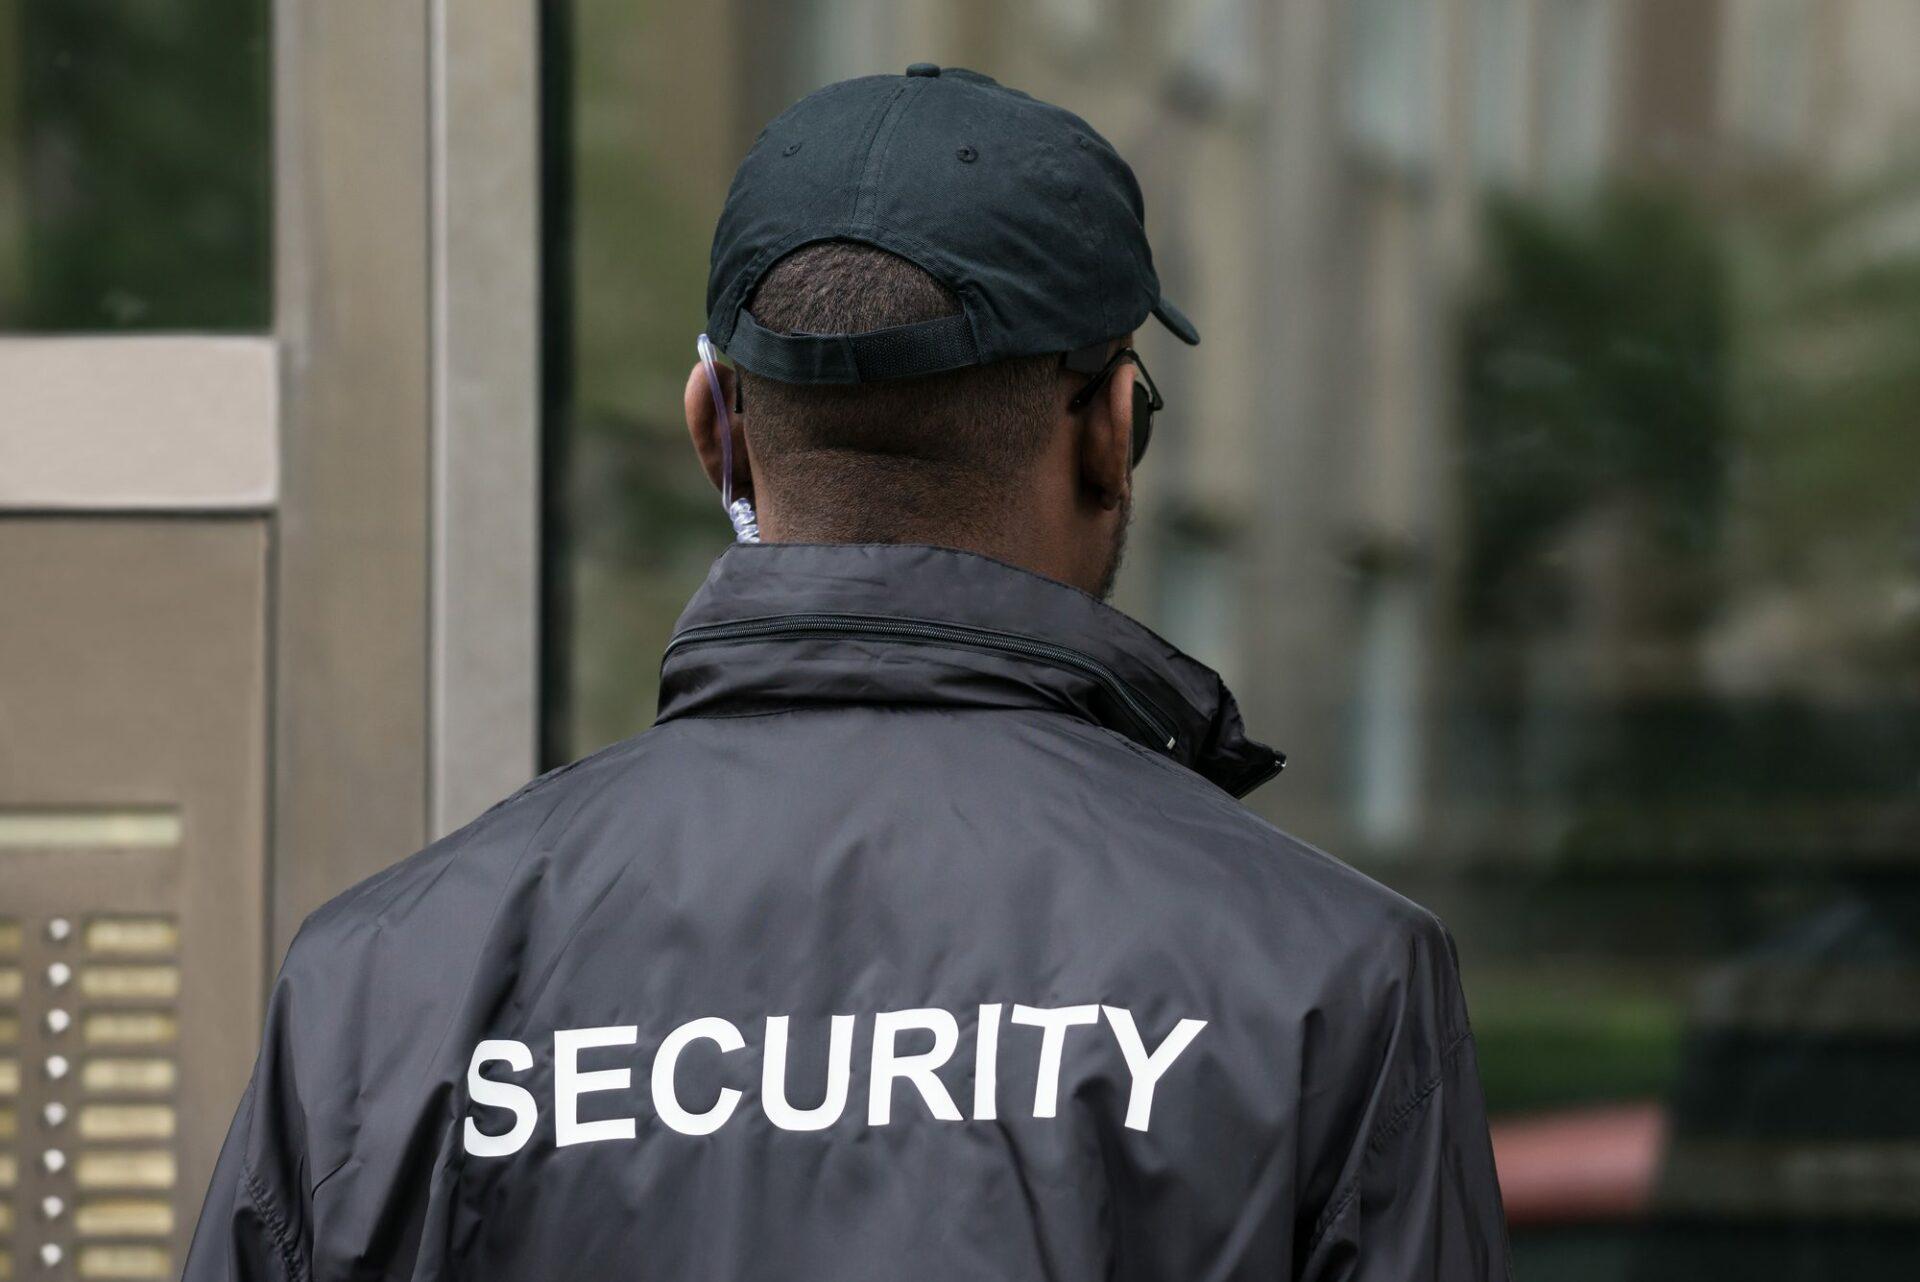 Motorola Security Radios Form the Cornerstone of Security Operations